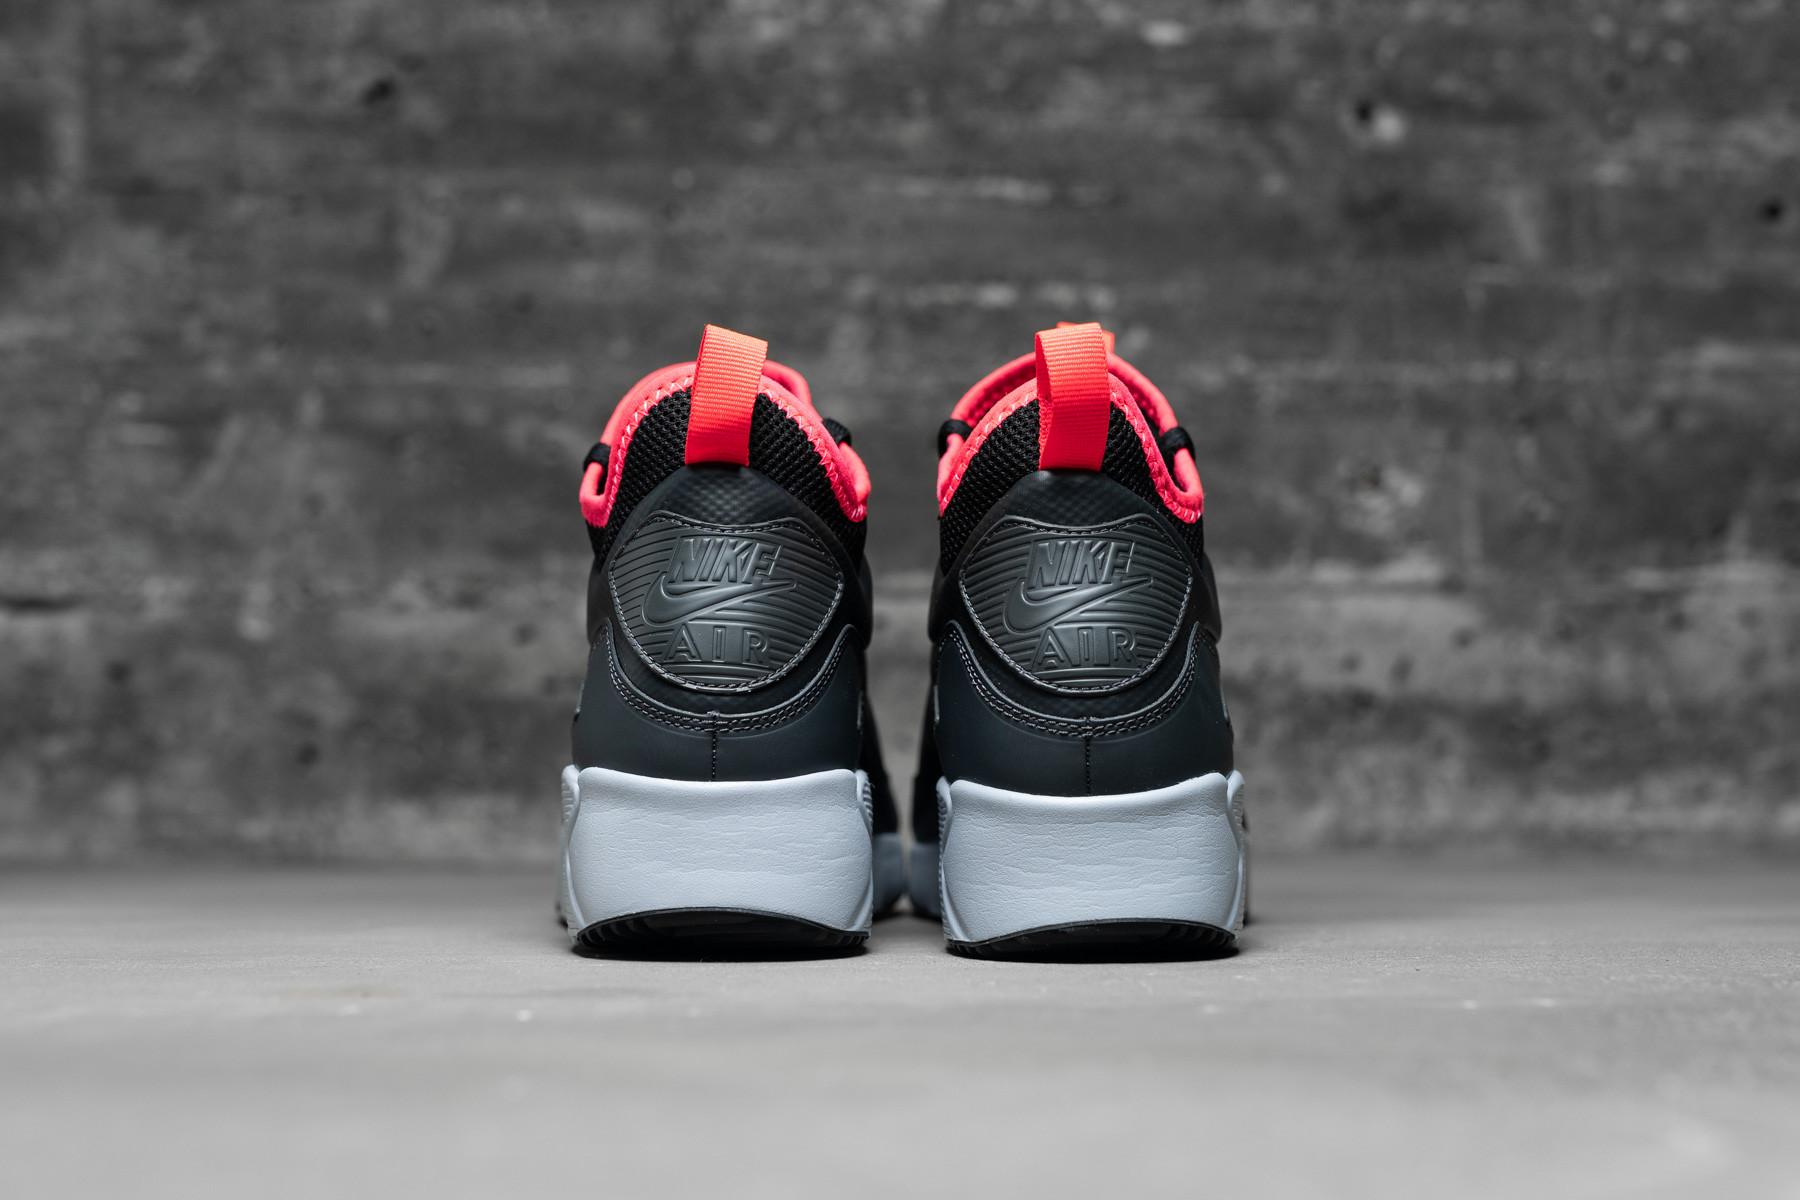 Nike Air Max 90 Ultra Mid Winter Sneaker.no